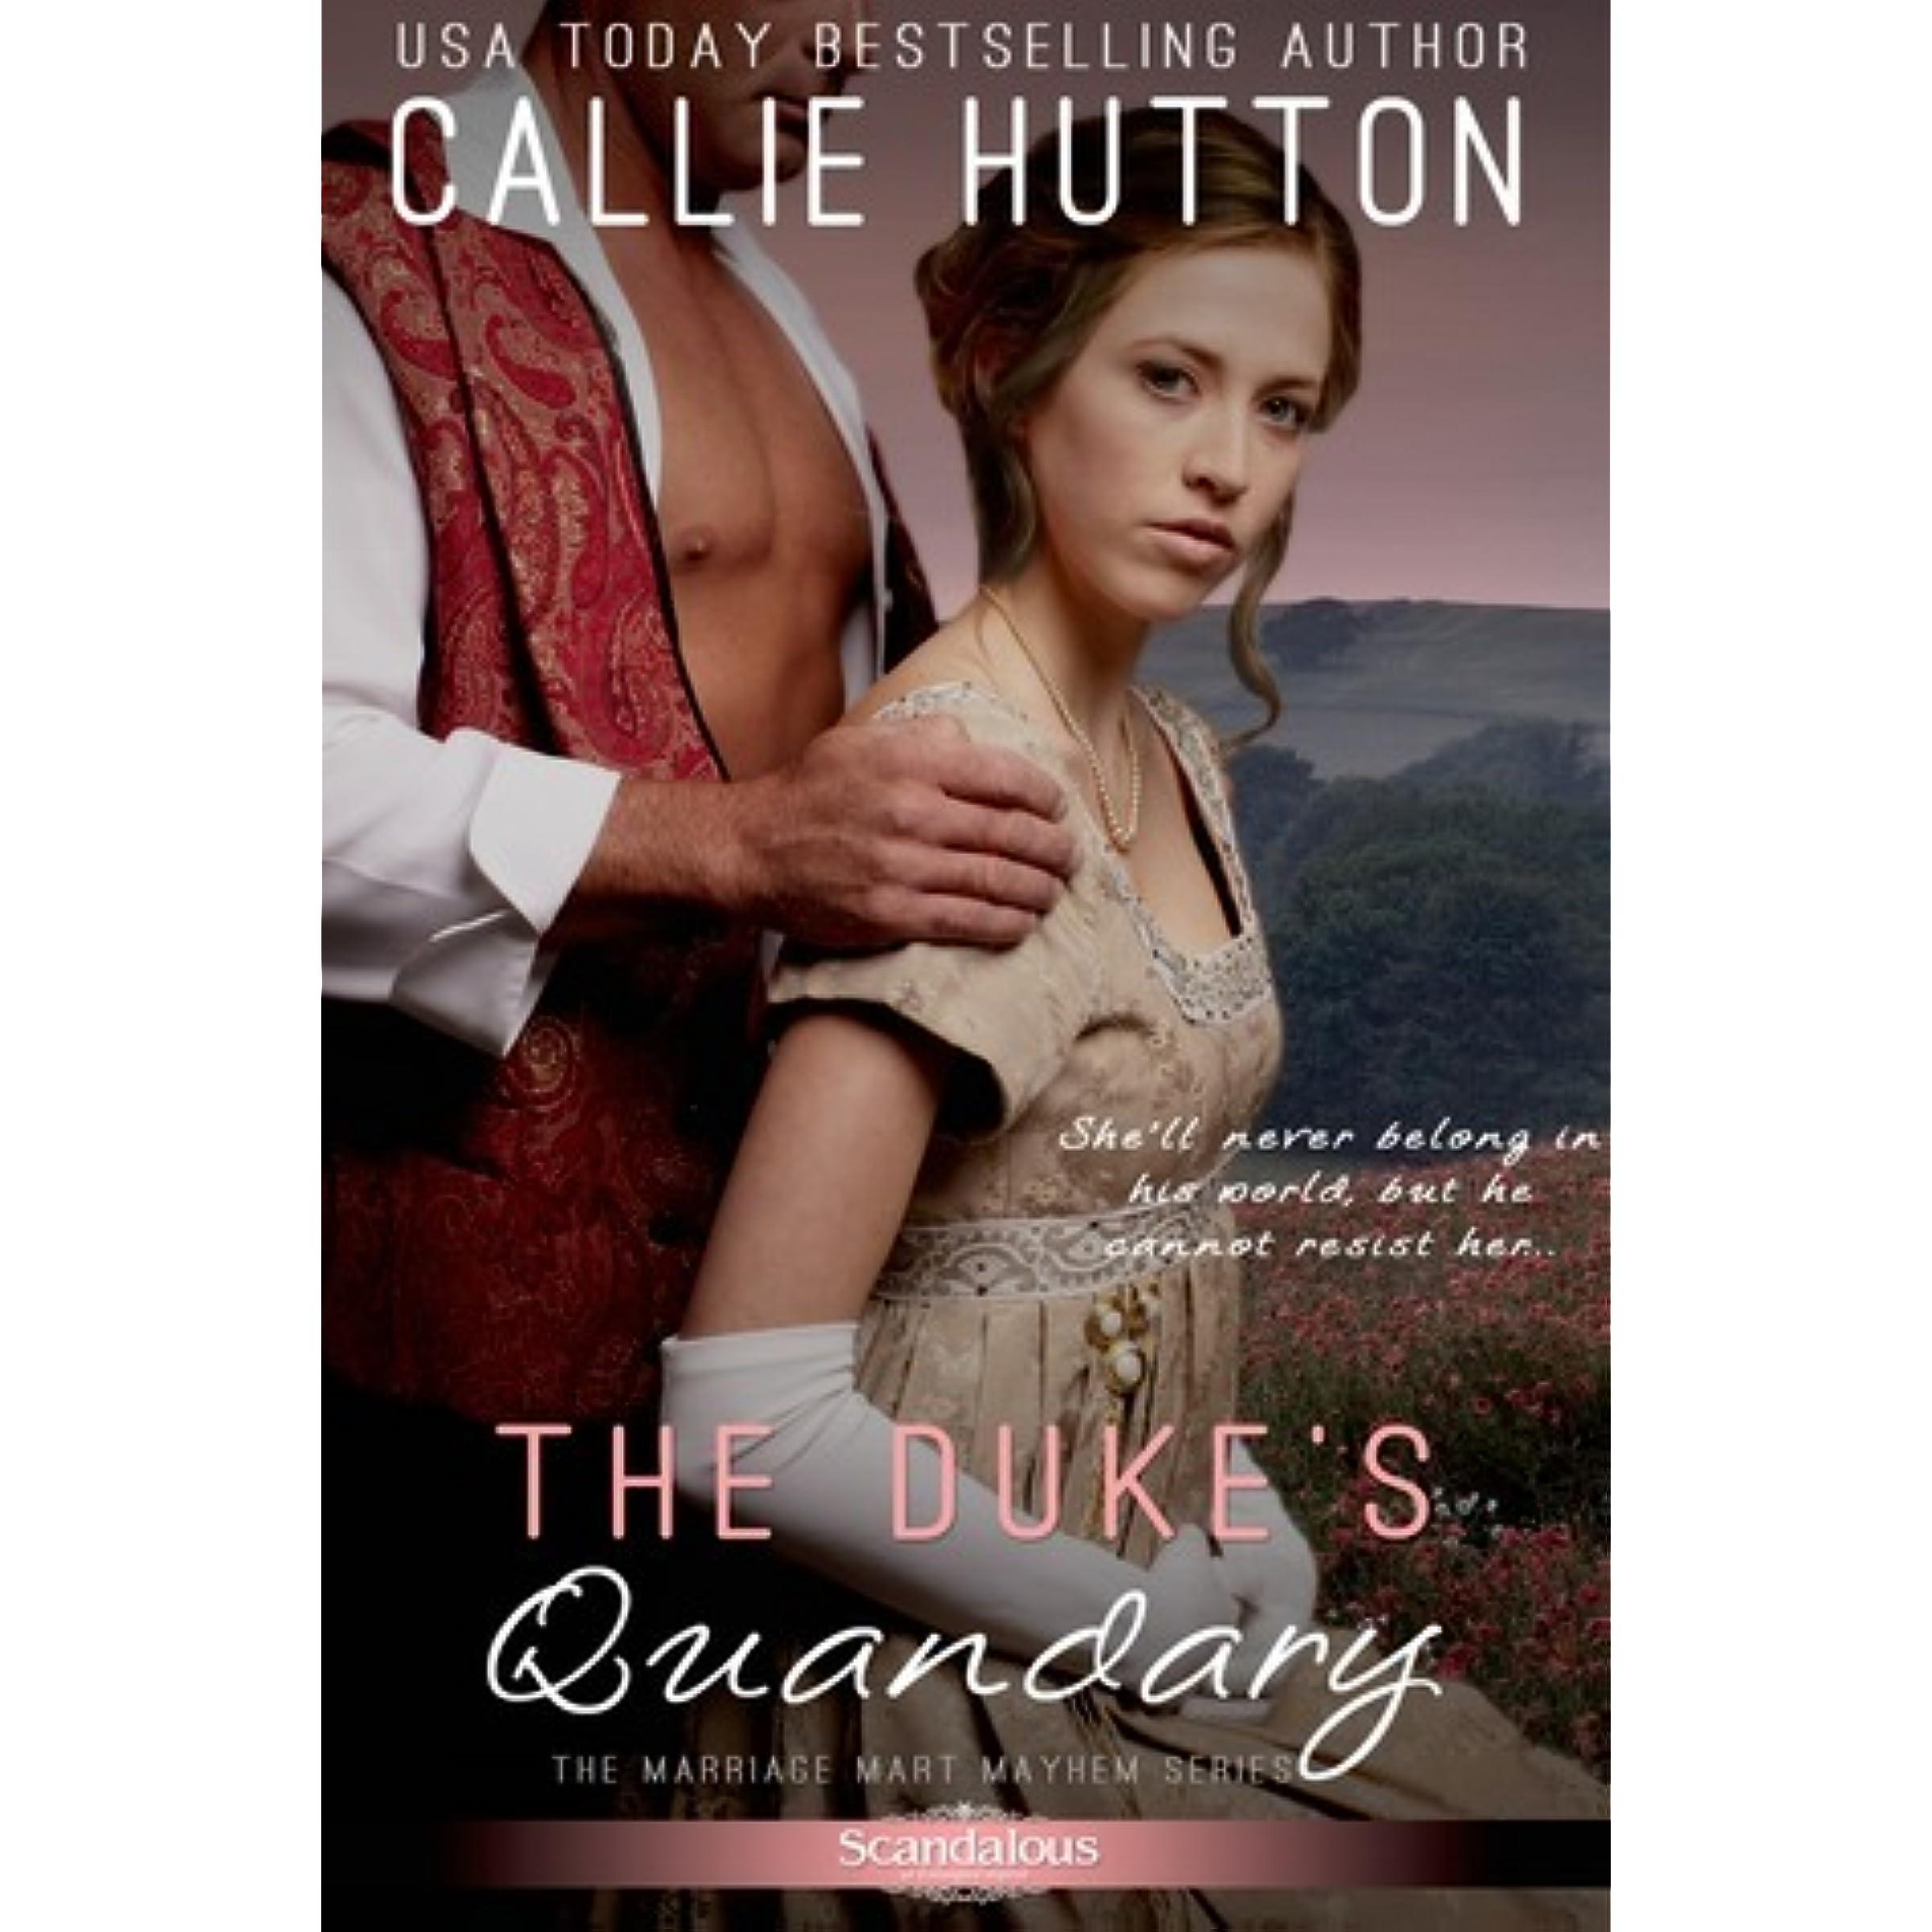 The Duke's Quandary (Marriage Mart Mayhem #2) by Callie Hutton